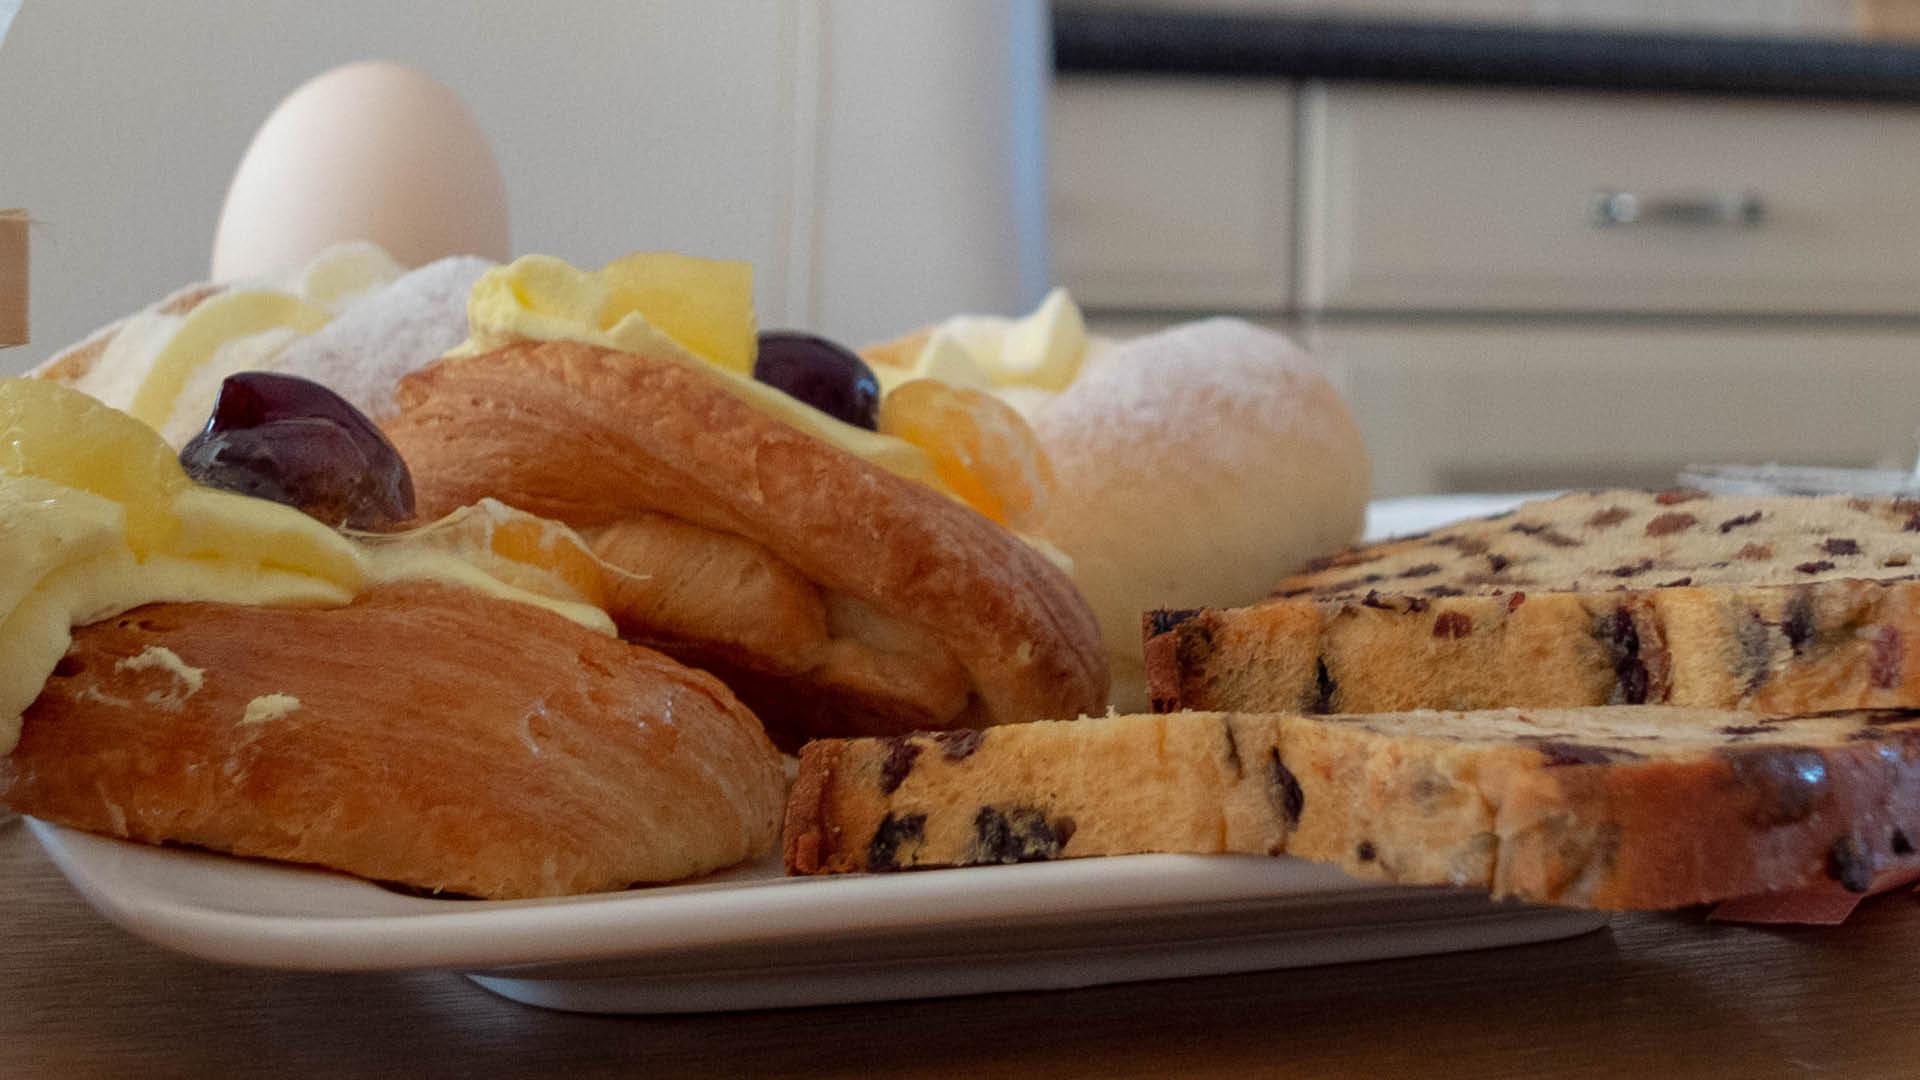 Slider ontbijtservice3